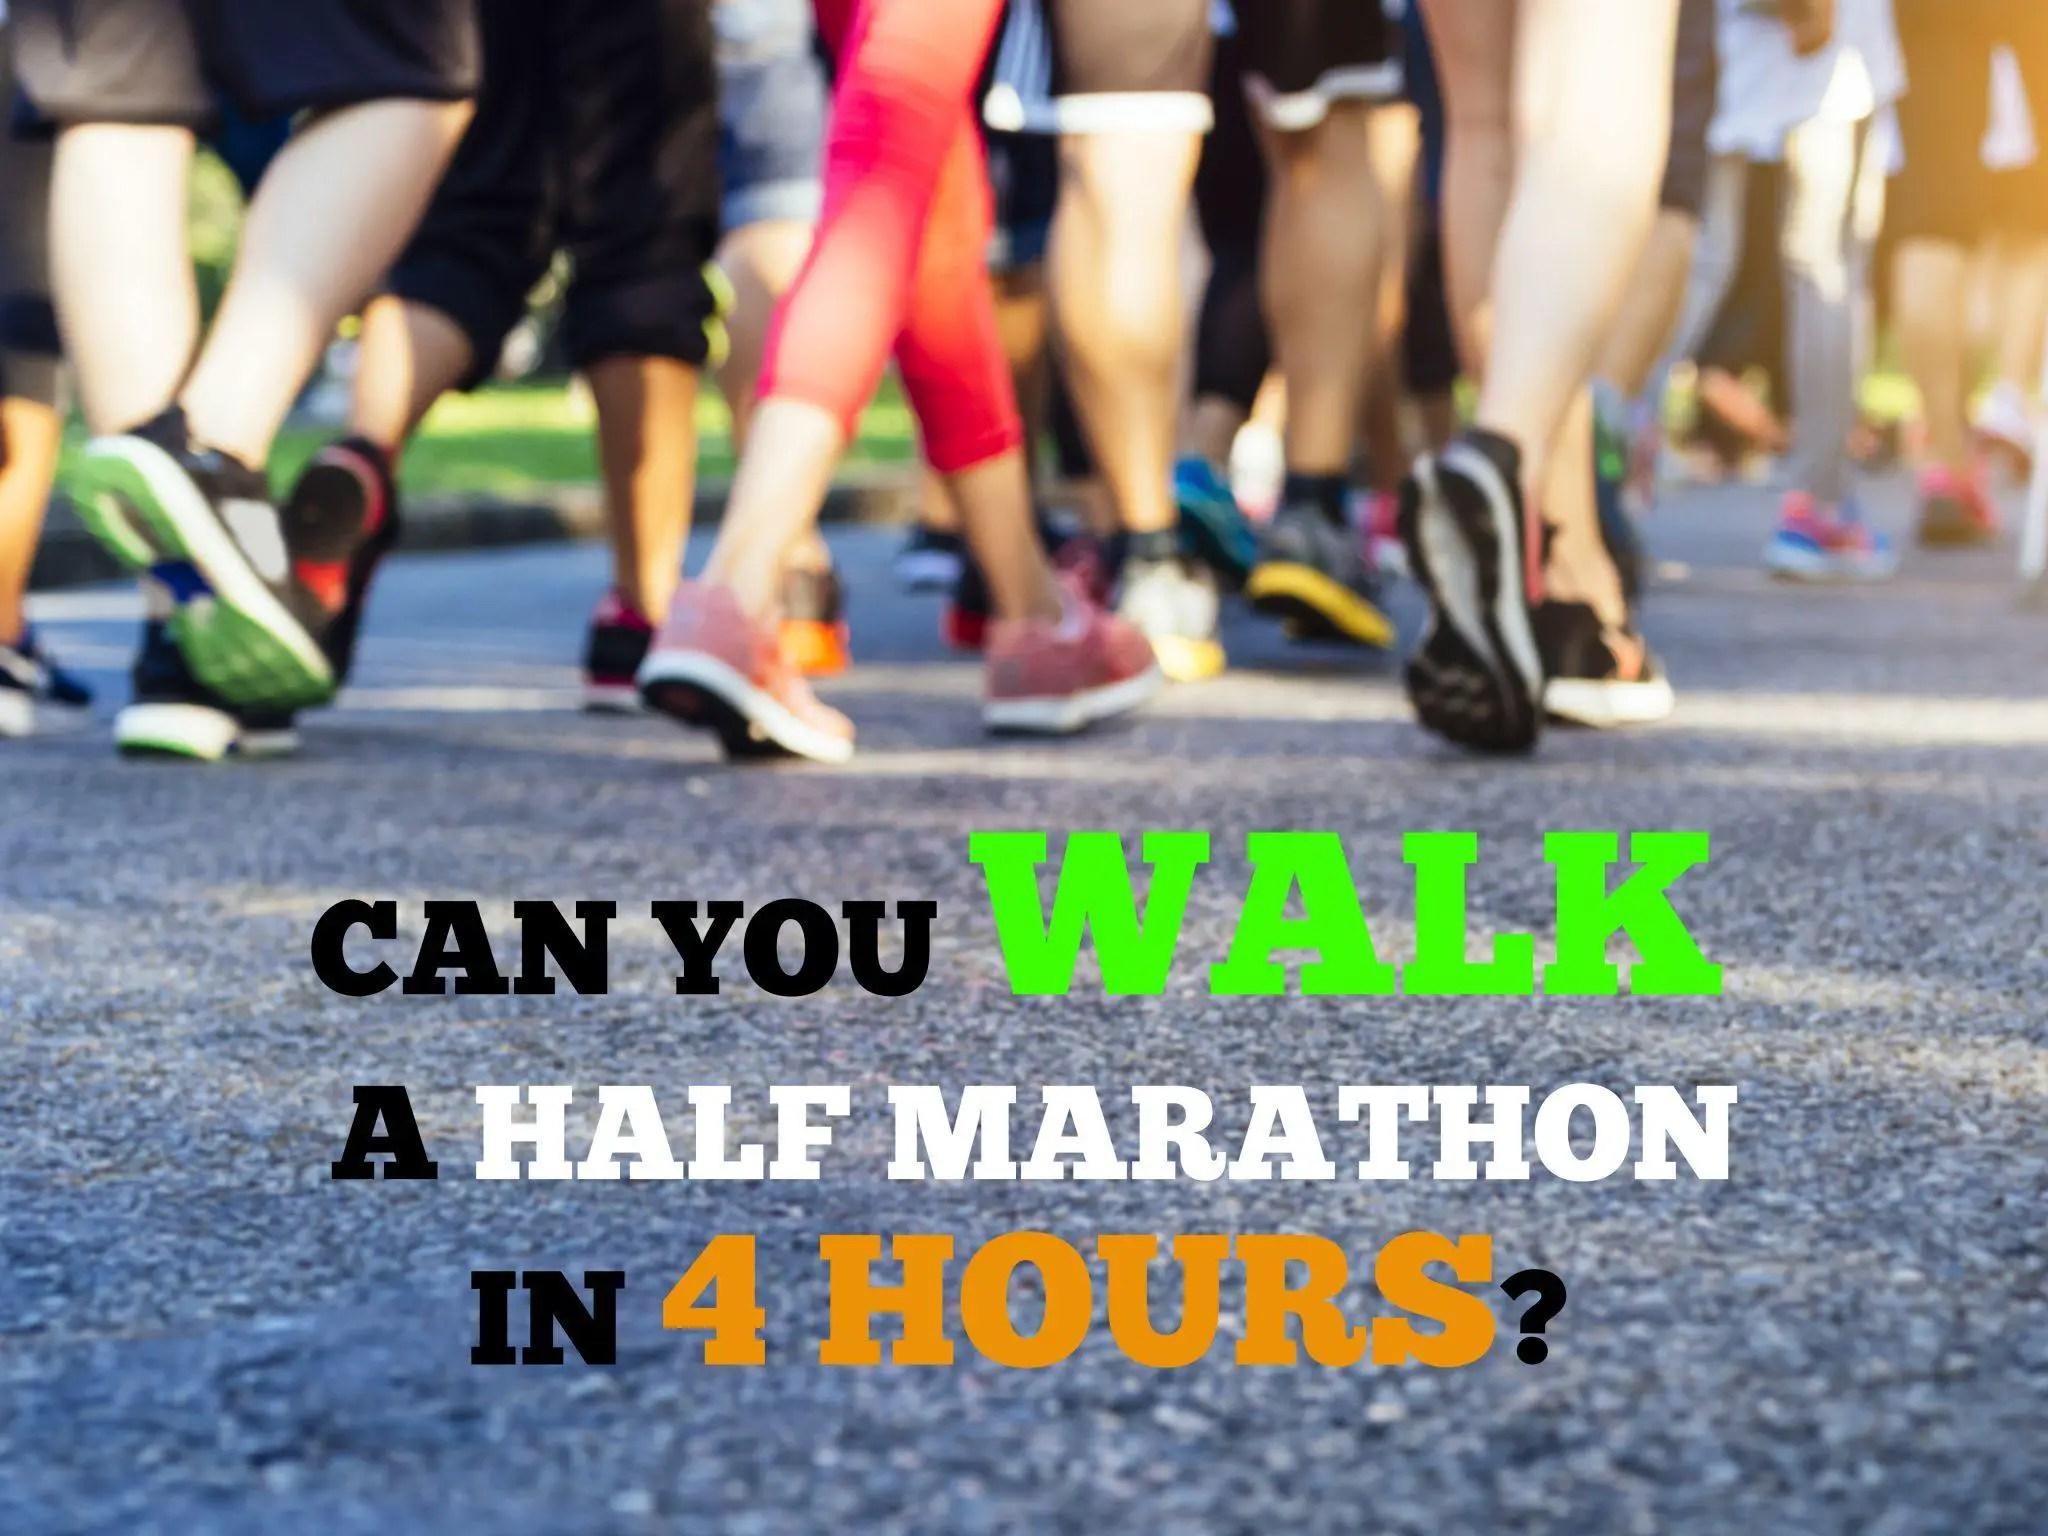 Can you walk a half marathon in 4 hours